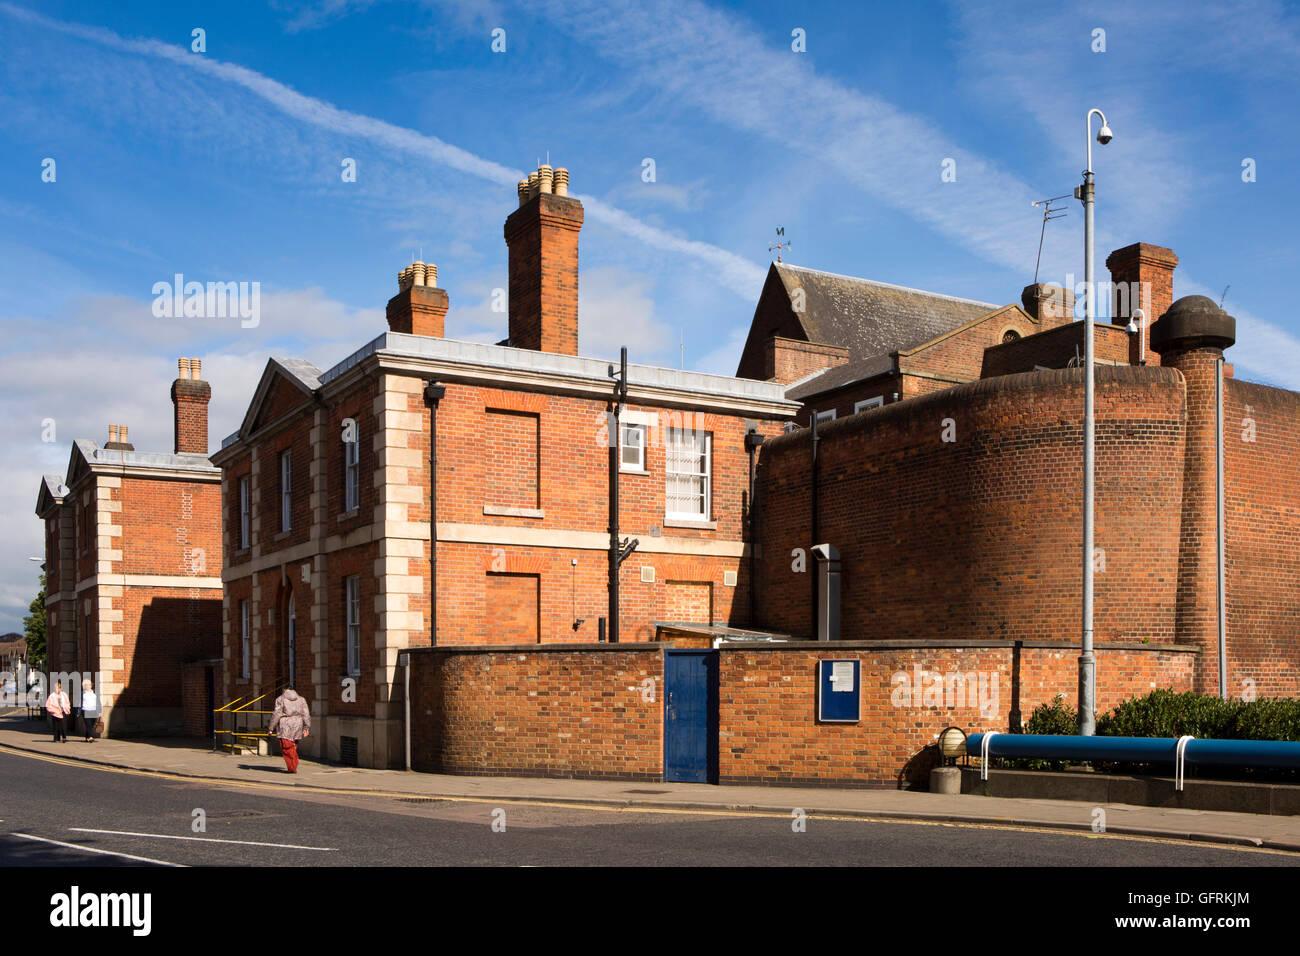 UK, England, Bedfordshire, Bedford, Bromham Road, HM Prison - Stock Image